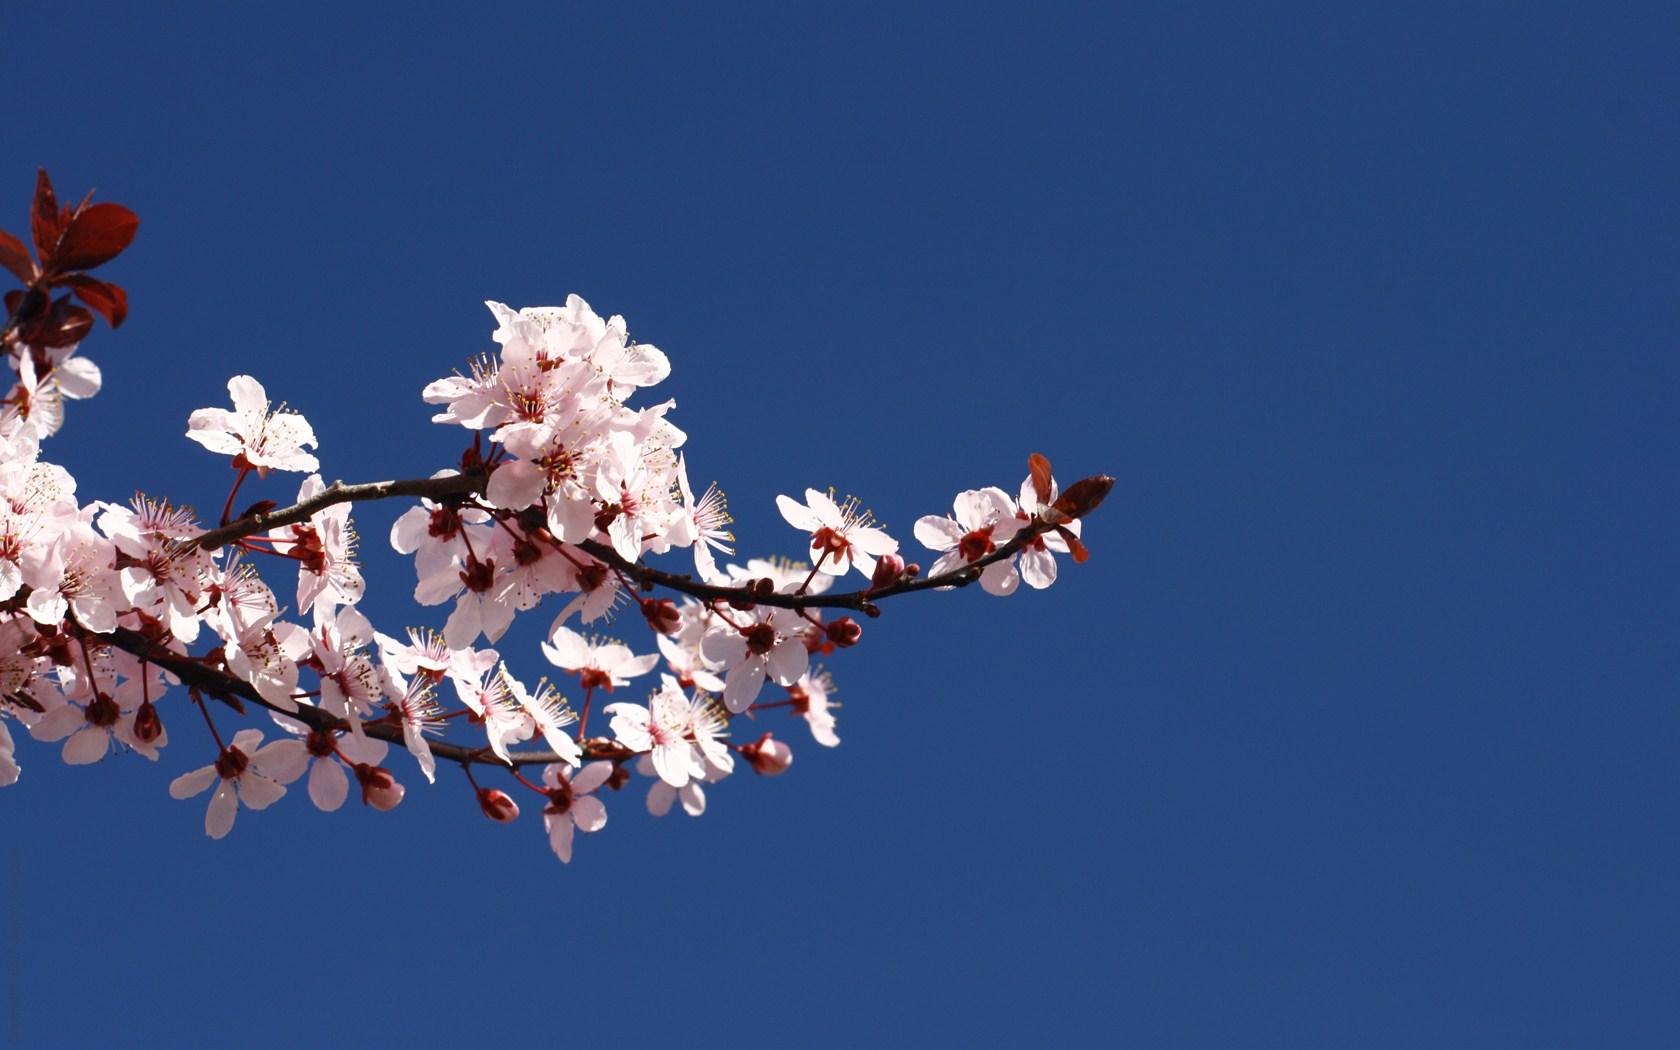 Blossom Branch Spring Wallpaper [1680x1050]